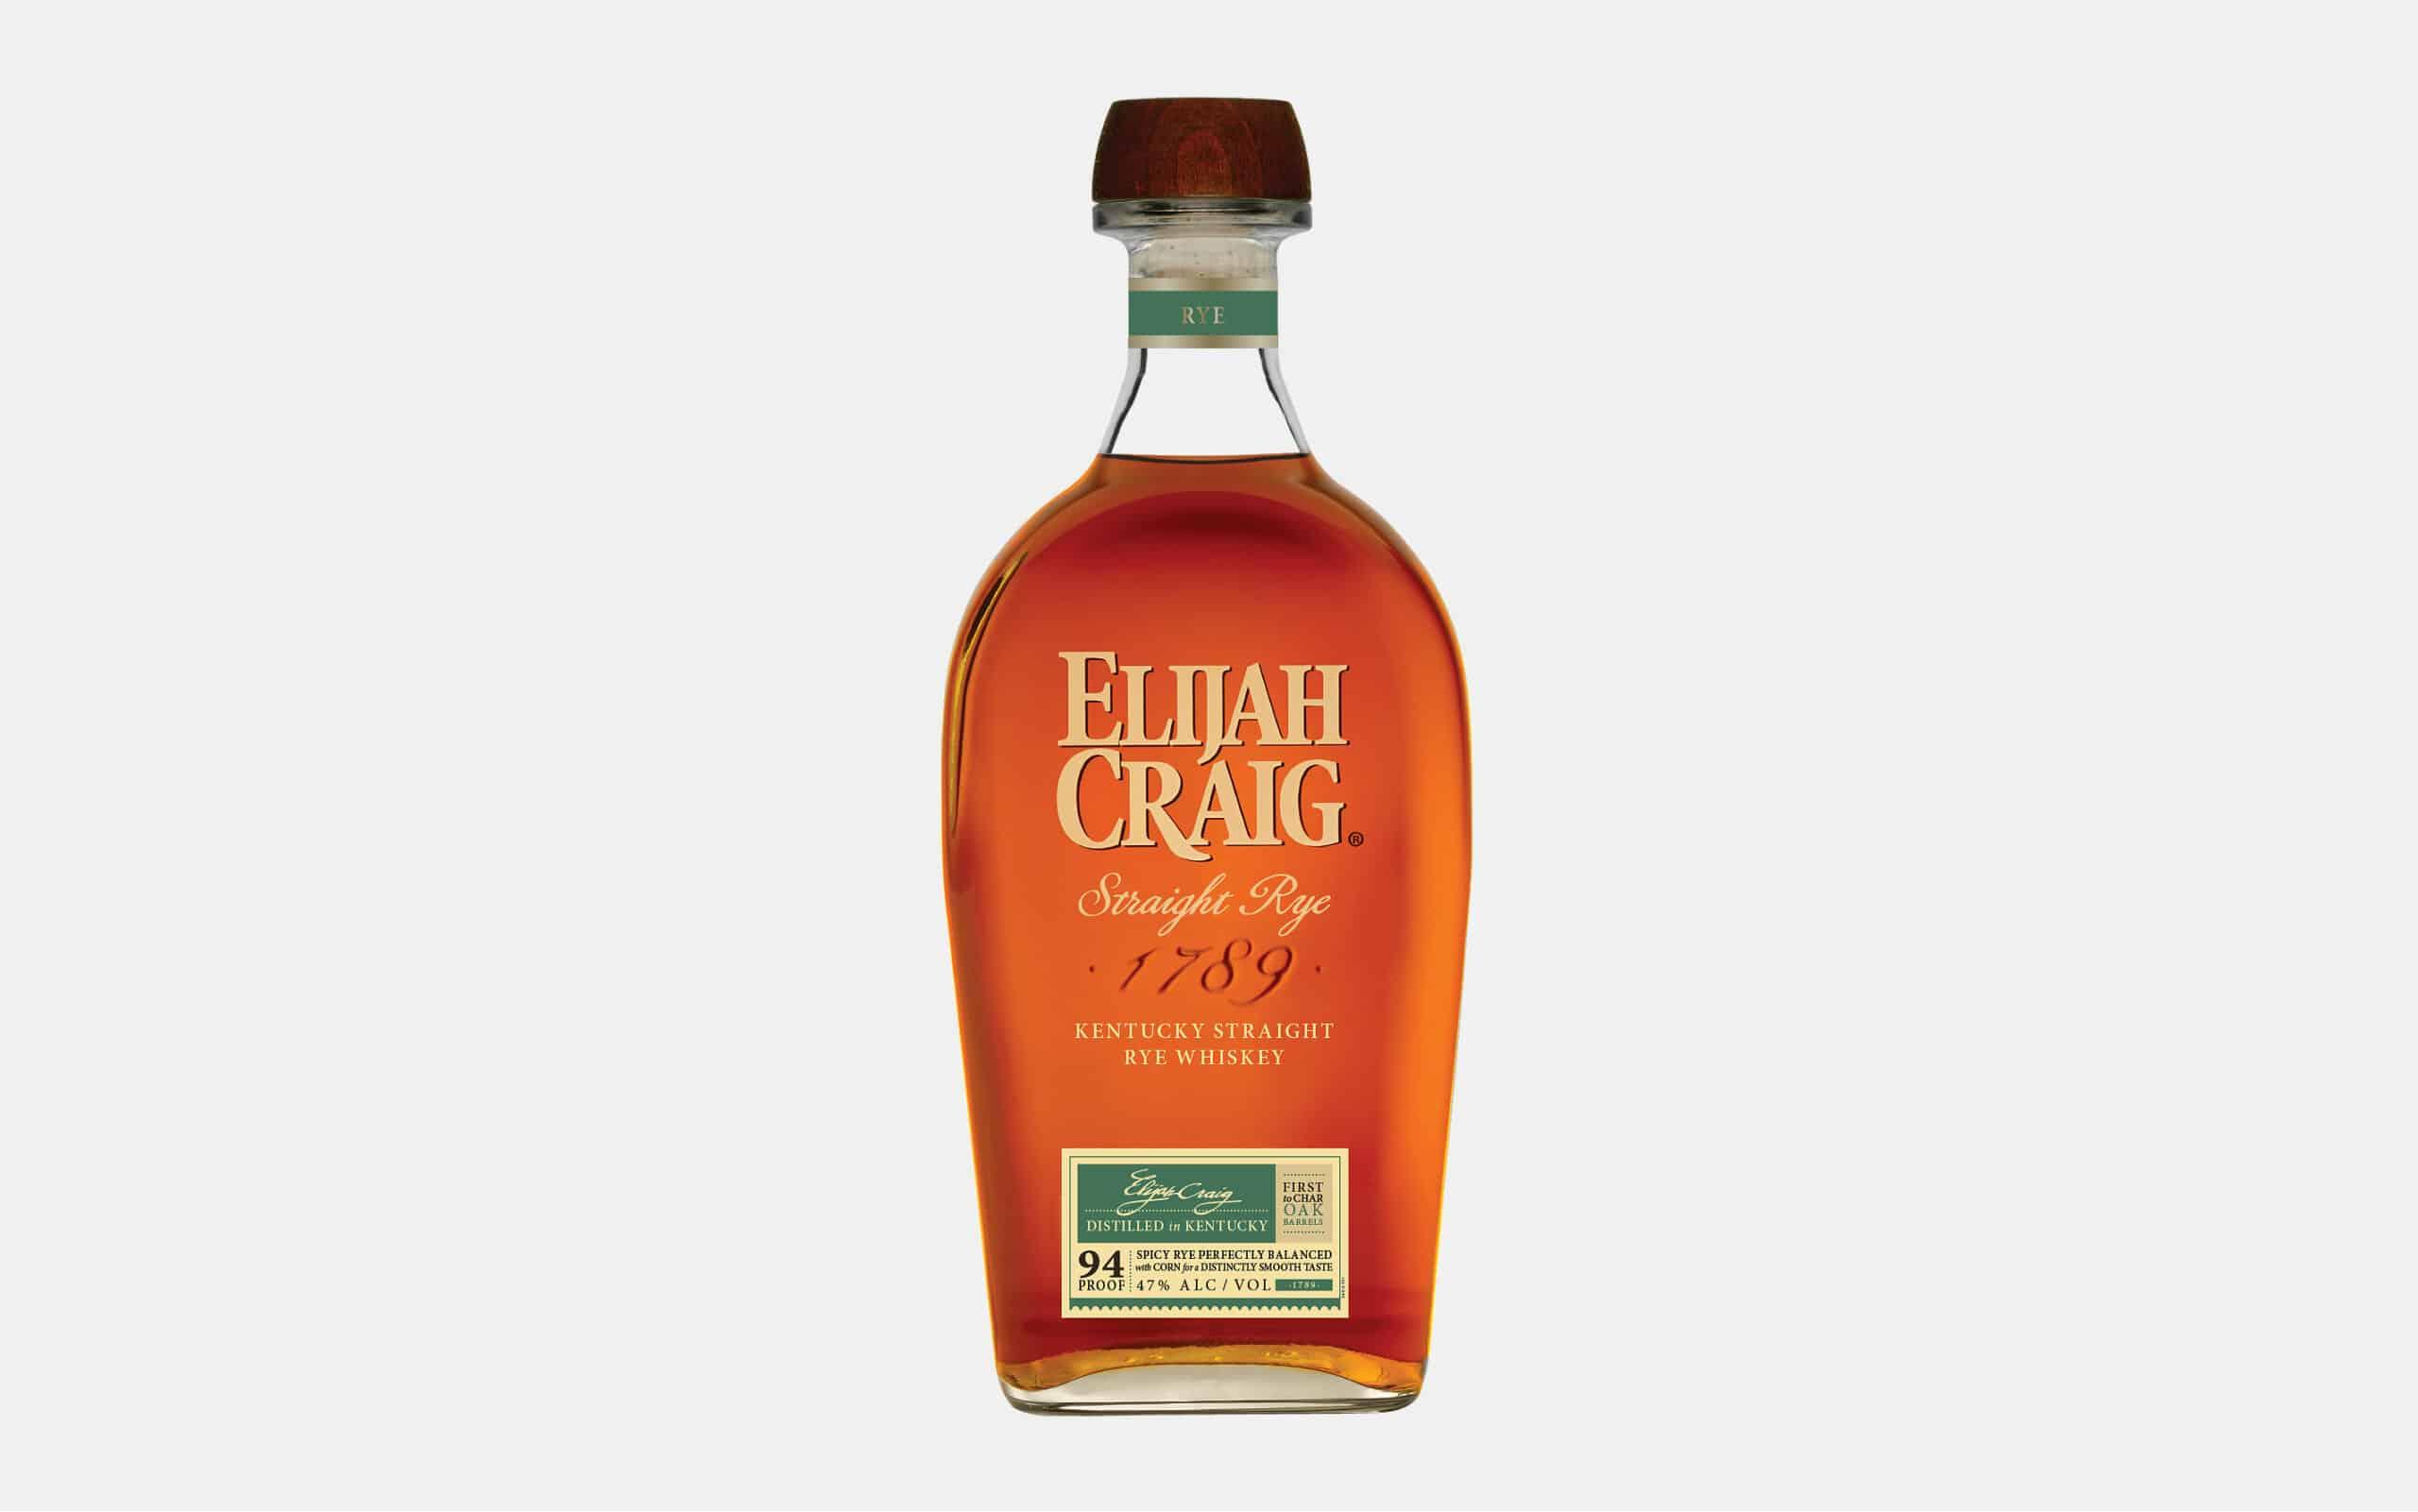 Elijah Craig Kentucky Straight Rye Whiskey